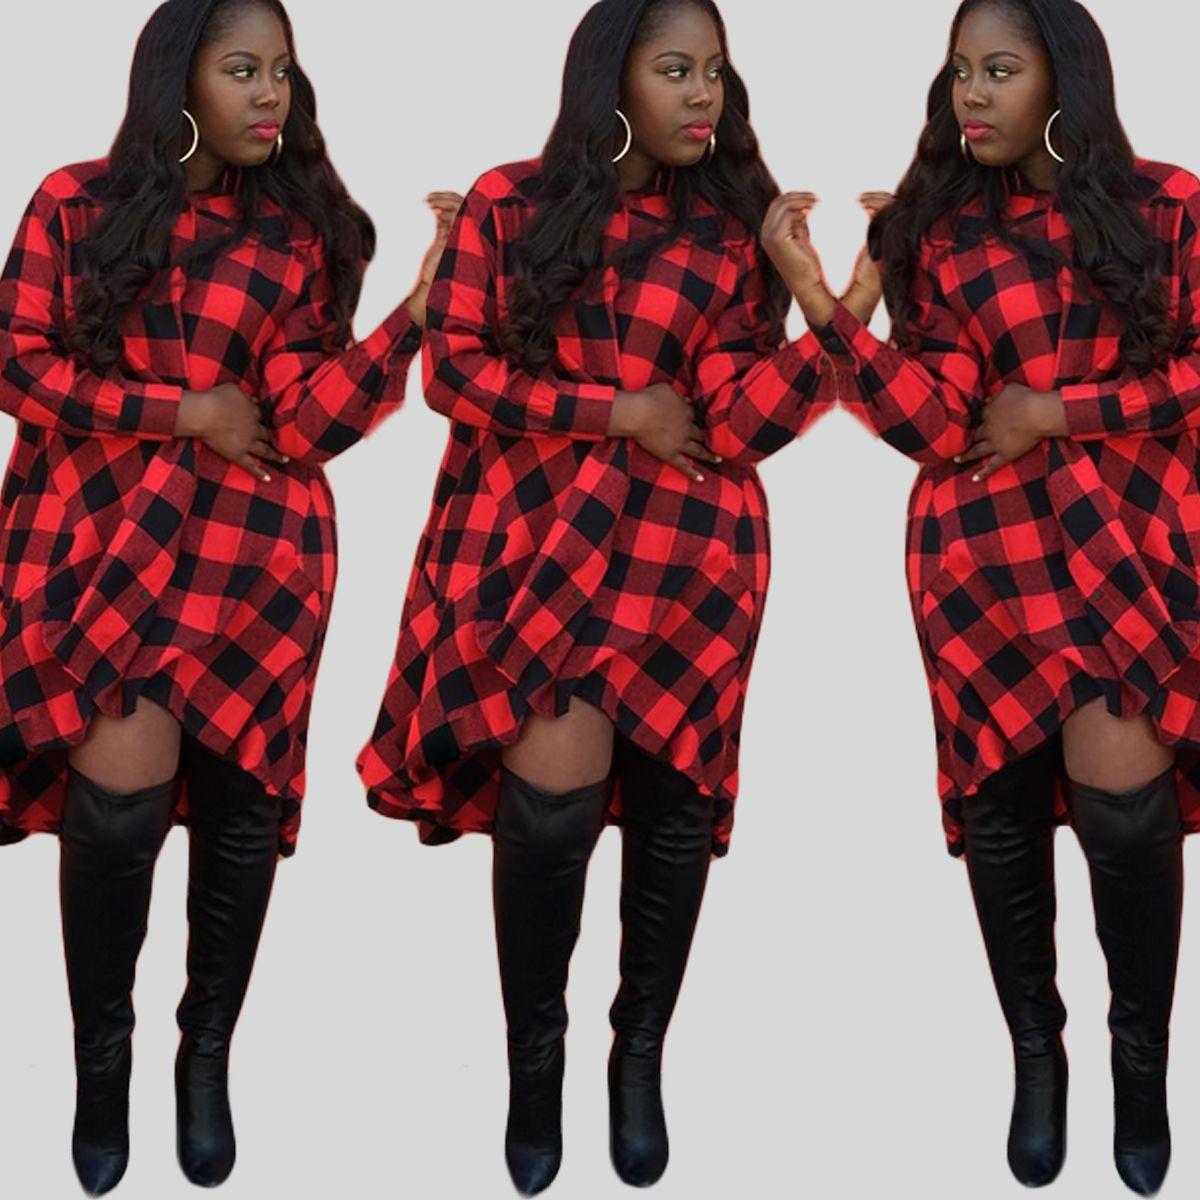 Black t shirt dress knee length - 3xl Women Leisure Plus Size Dress Red Plaid Full Sleeve Knee Length T Shirt Dress Oversize Dresses Vestidos Hot Styles Girls Dresses Gown From Annieyu